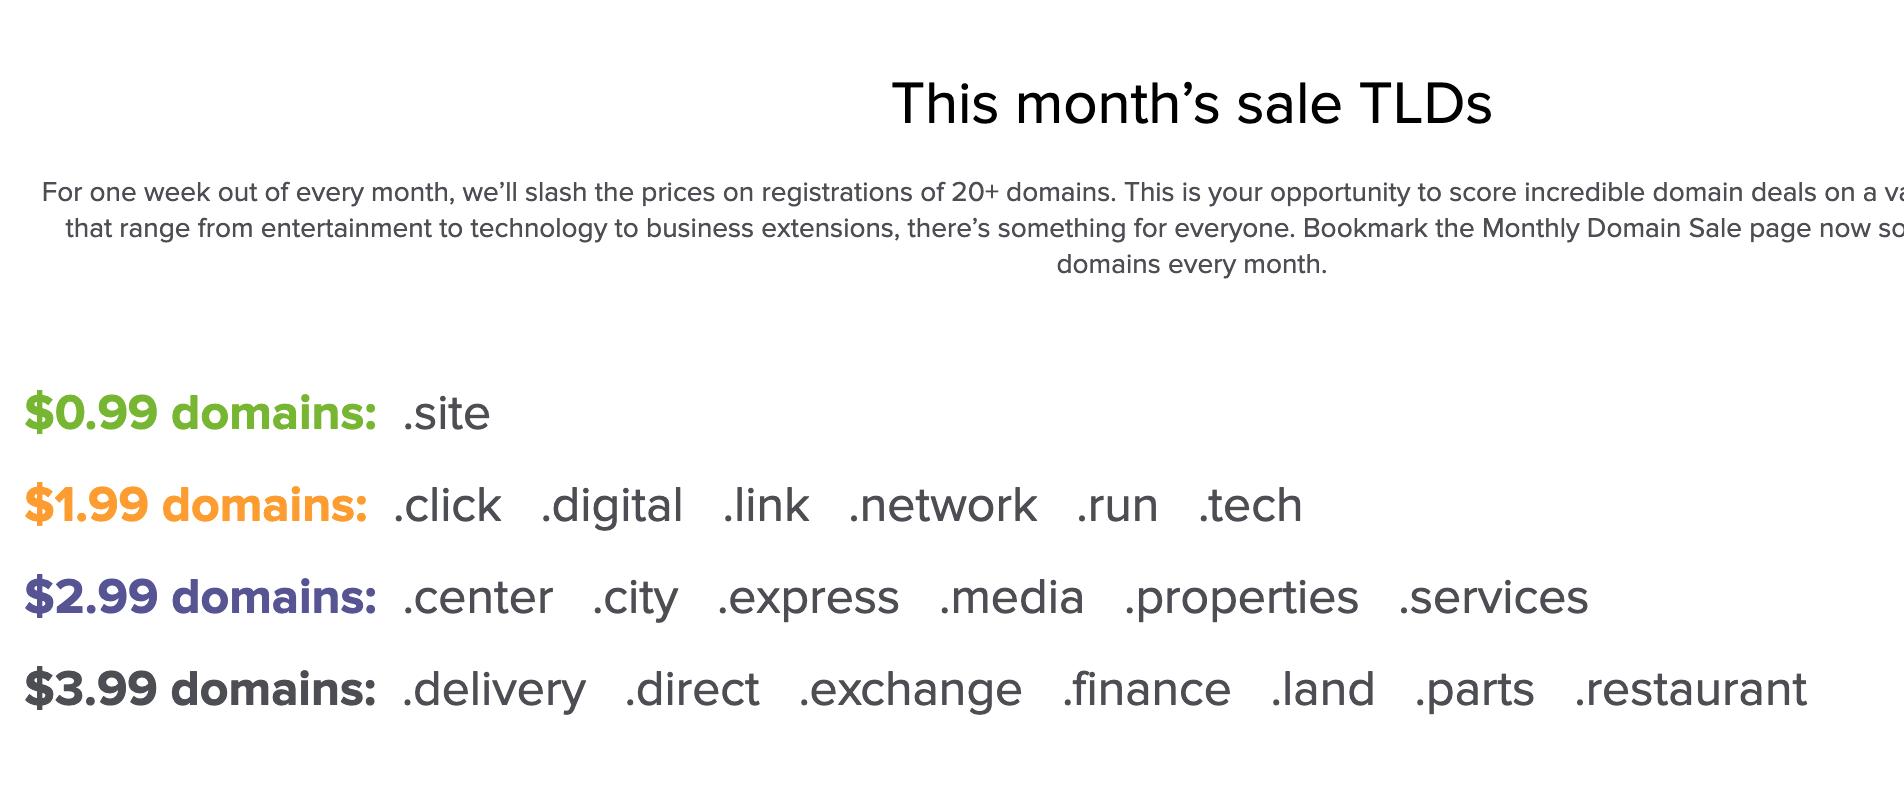 Name.com每月都有特价域名促销